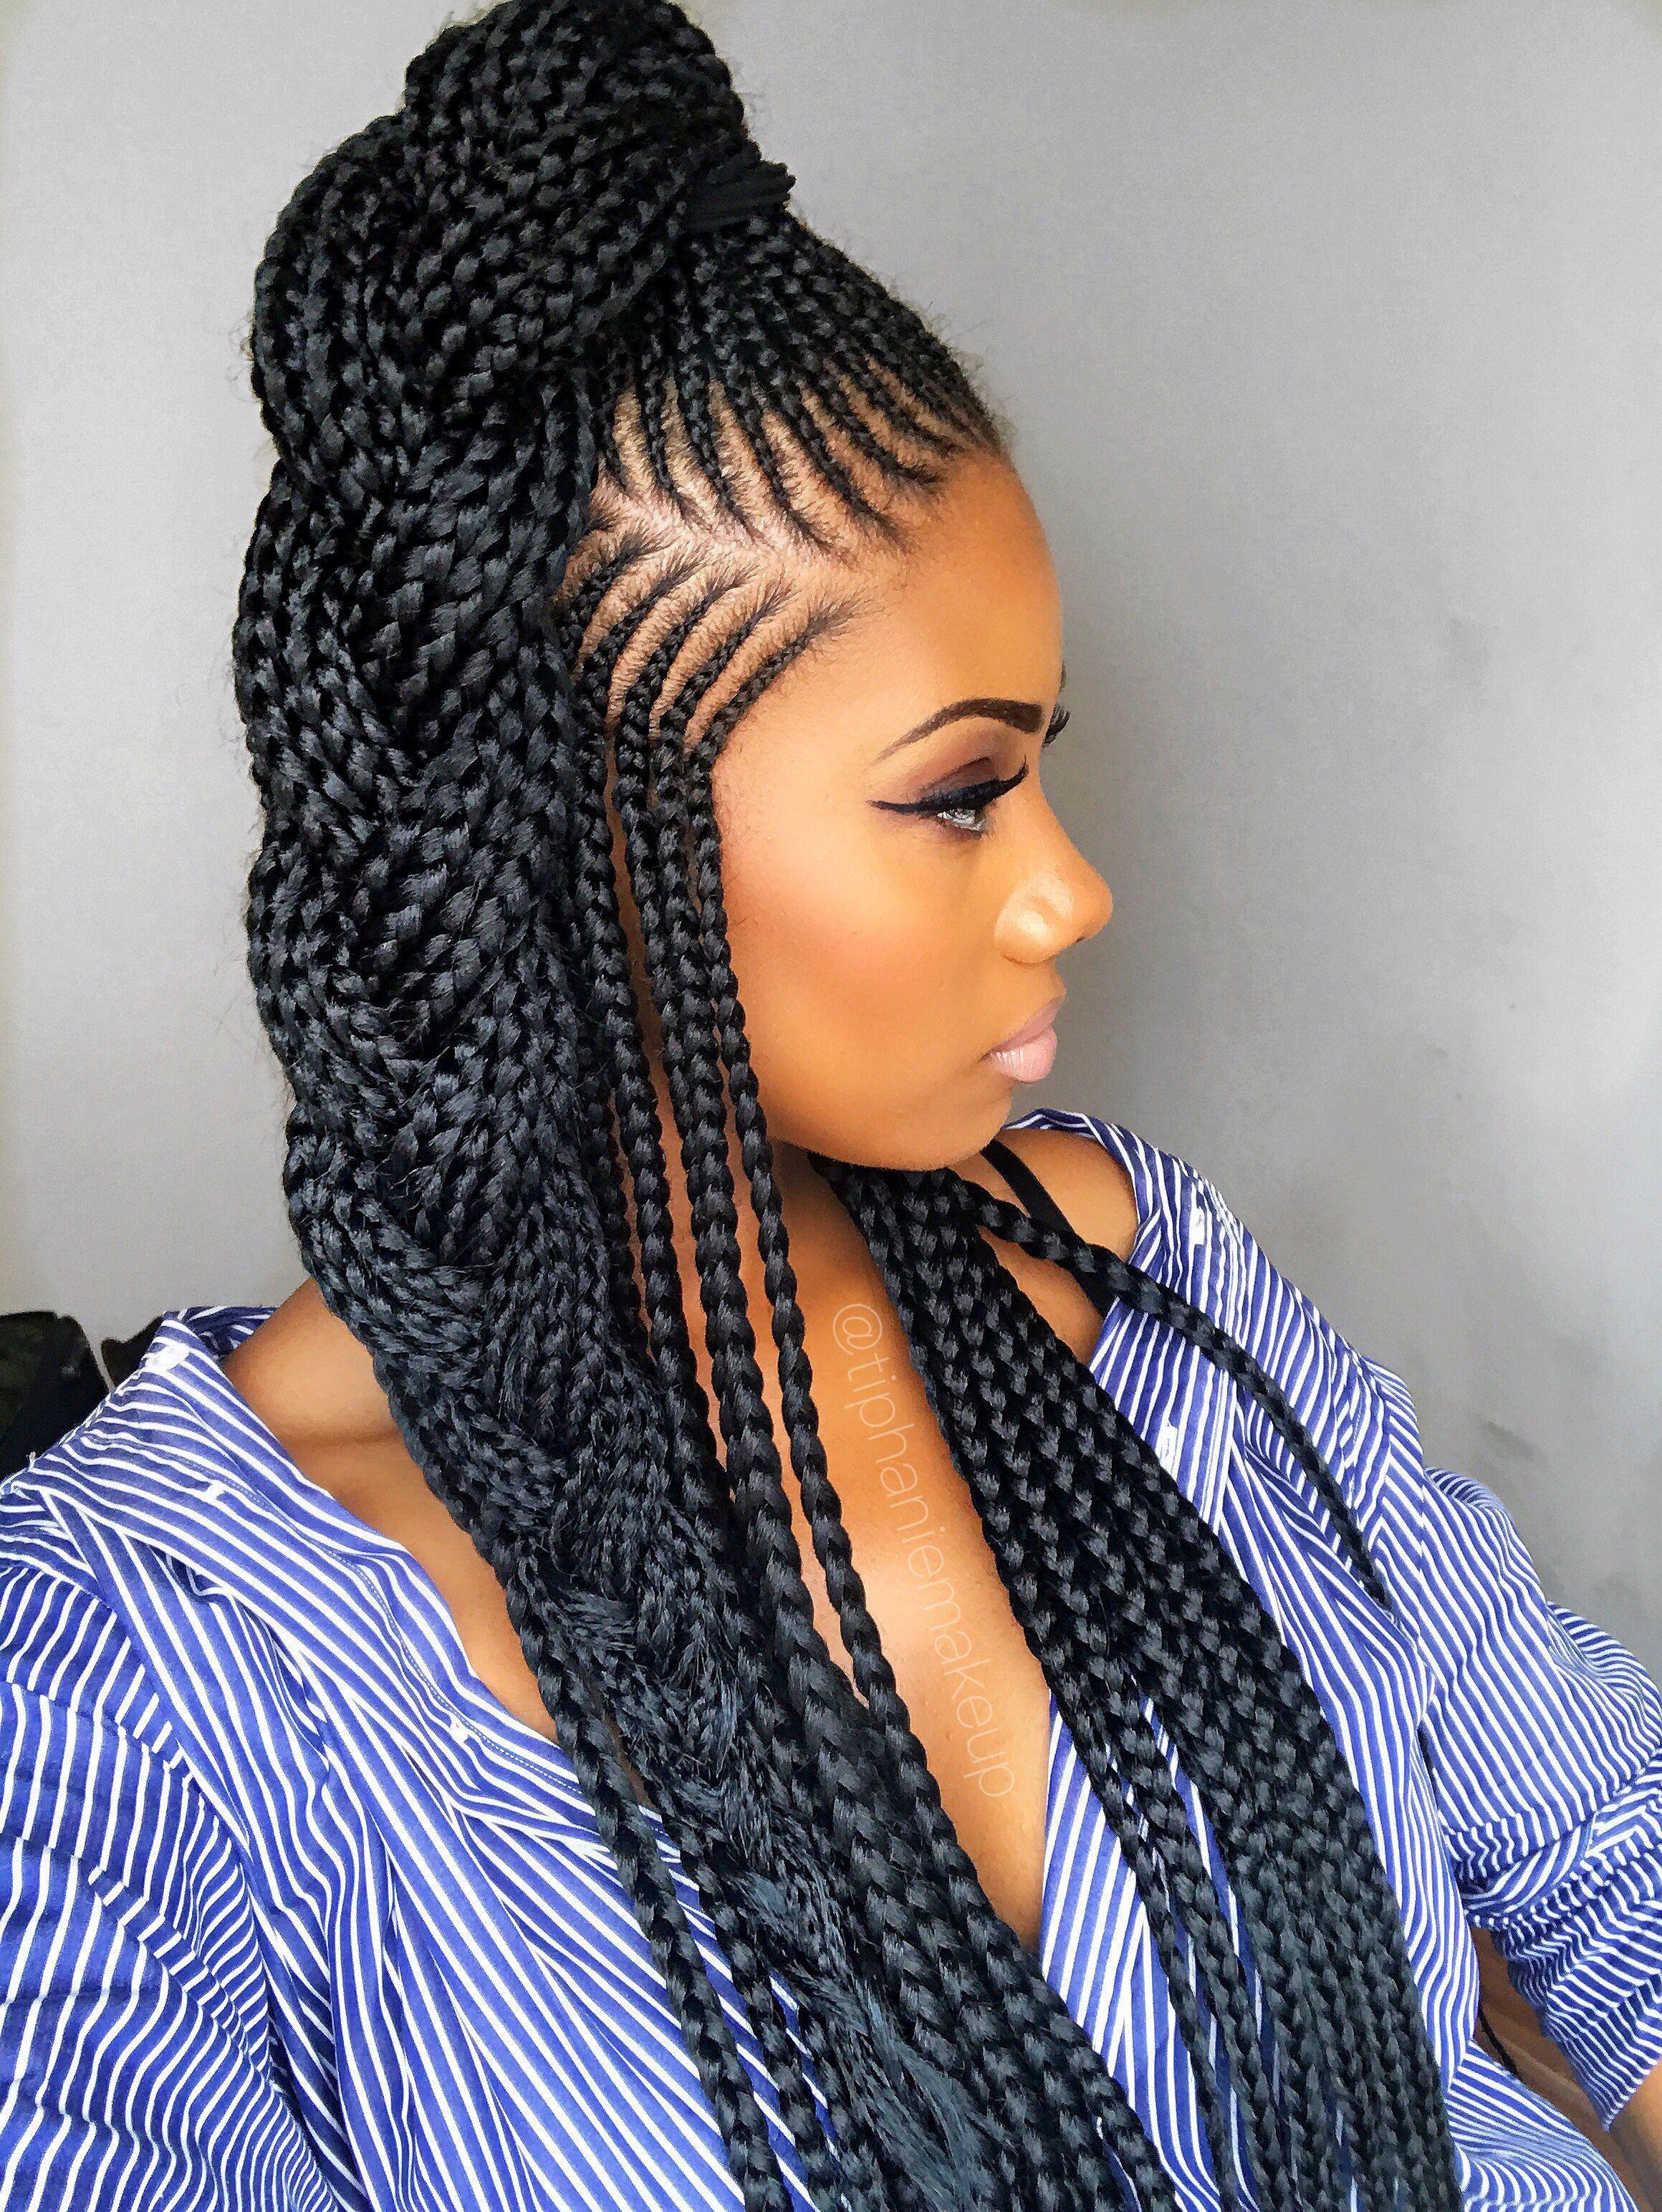 Braid Hairstyle Braided Hairstyles Updo African Hair Braiding Styles African Braids Hairstyles